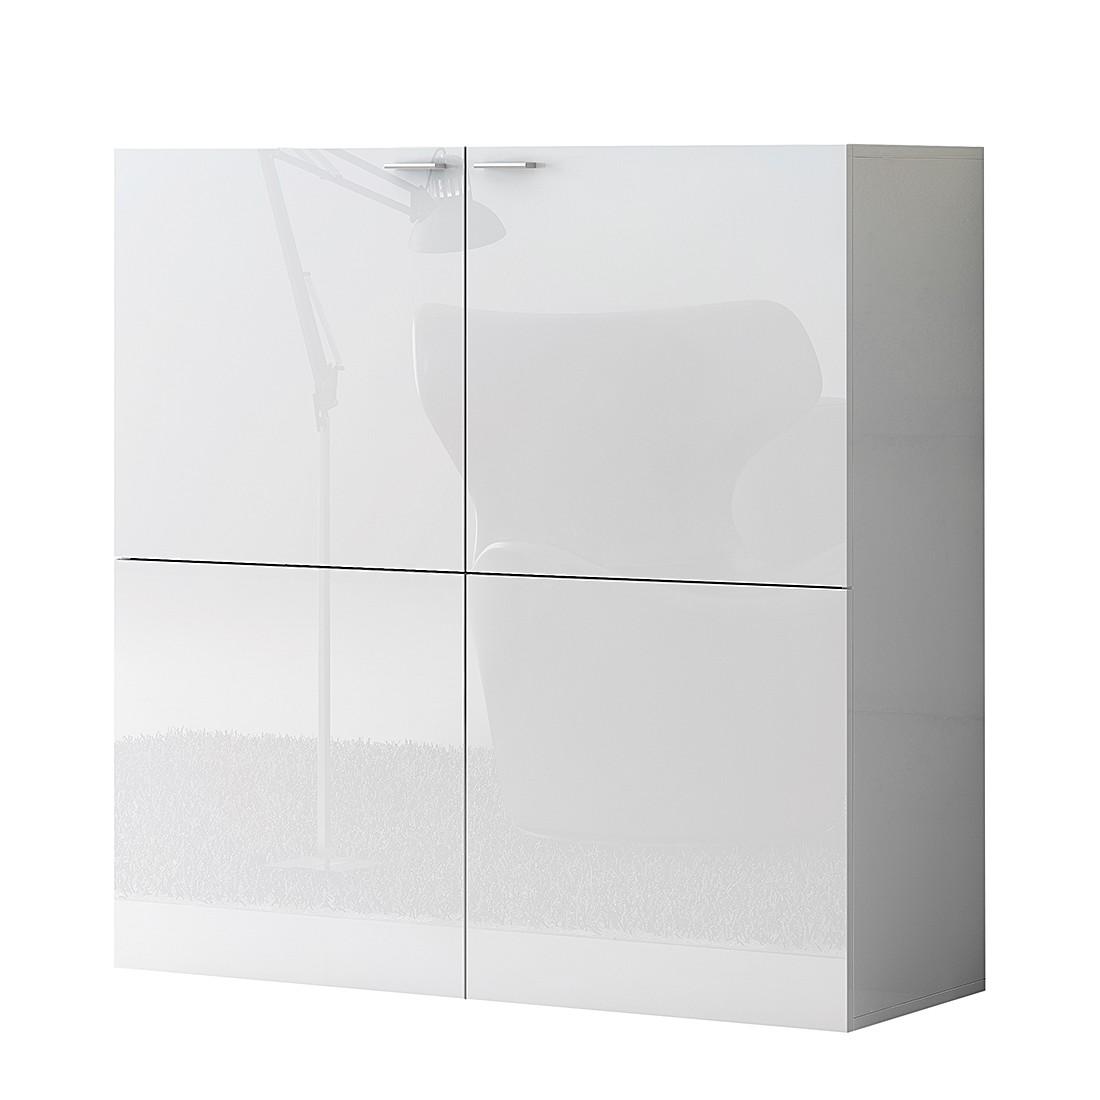 Commode Emporior - Blanc - Blanc brillant, Fredriks